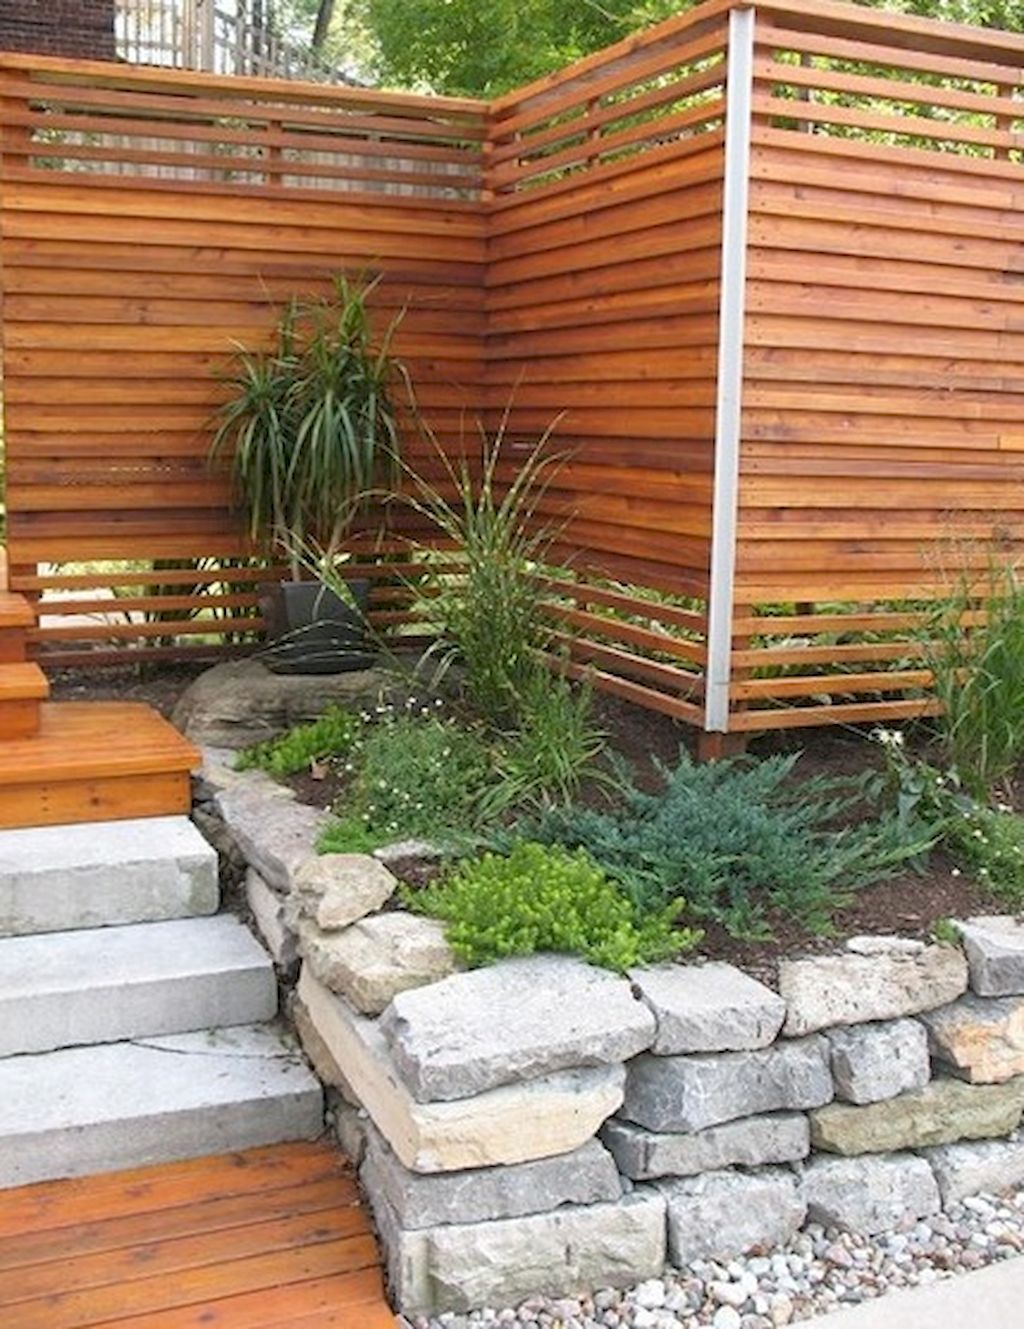 Cheap DIY Privacy Fence Ideas 29 | Backyard fences ...